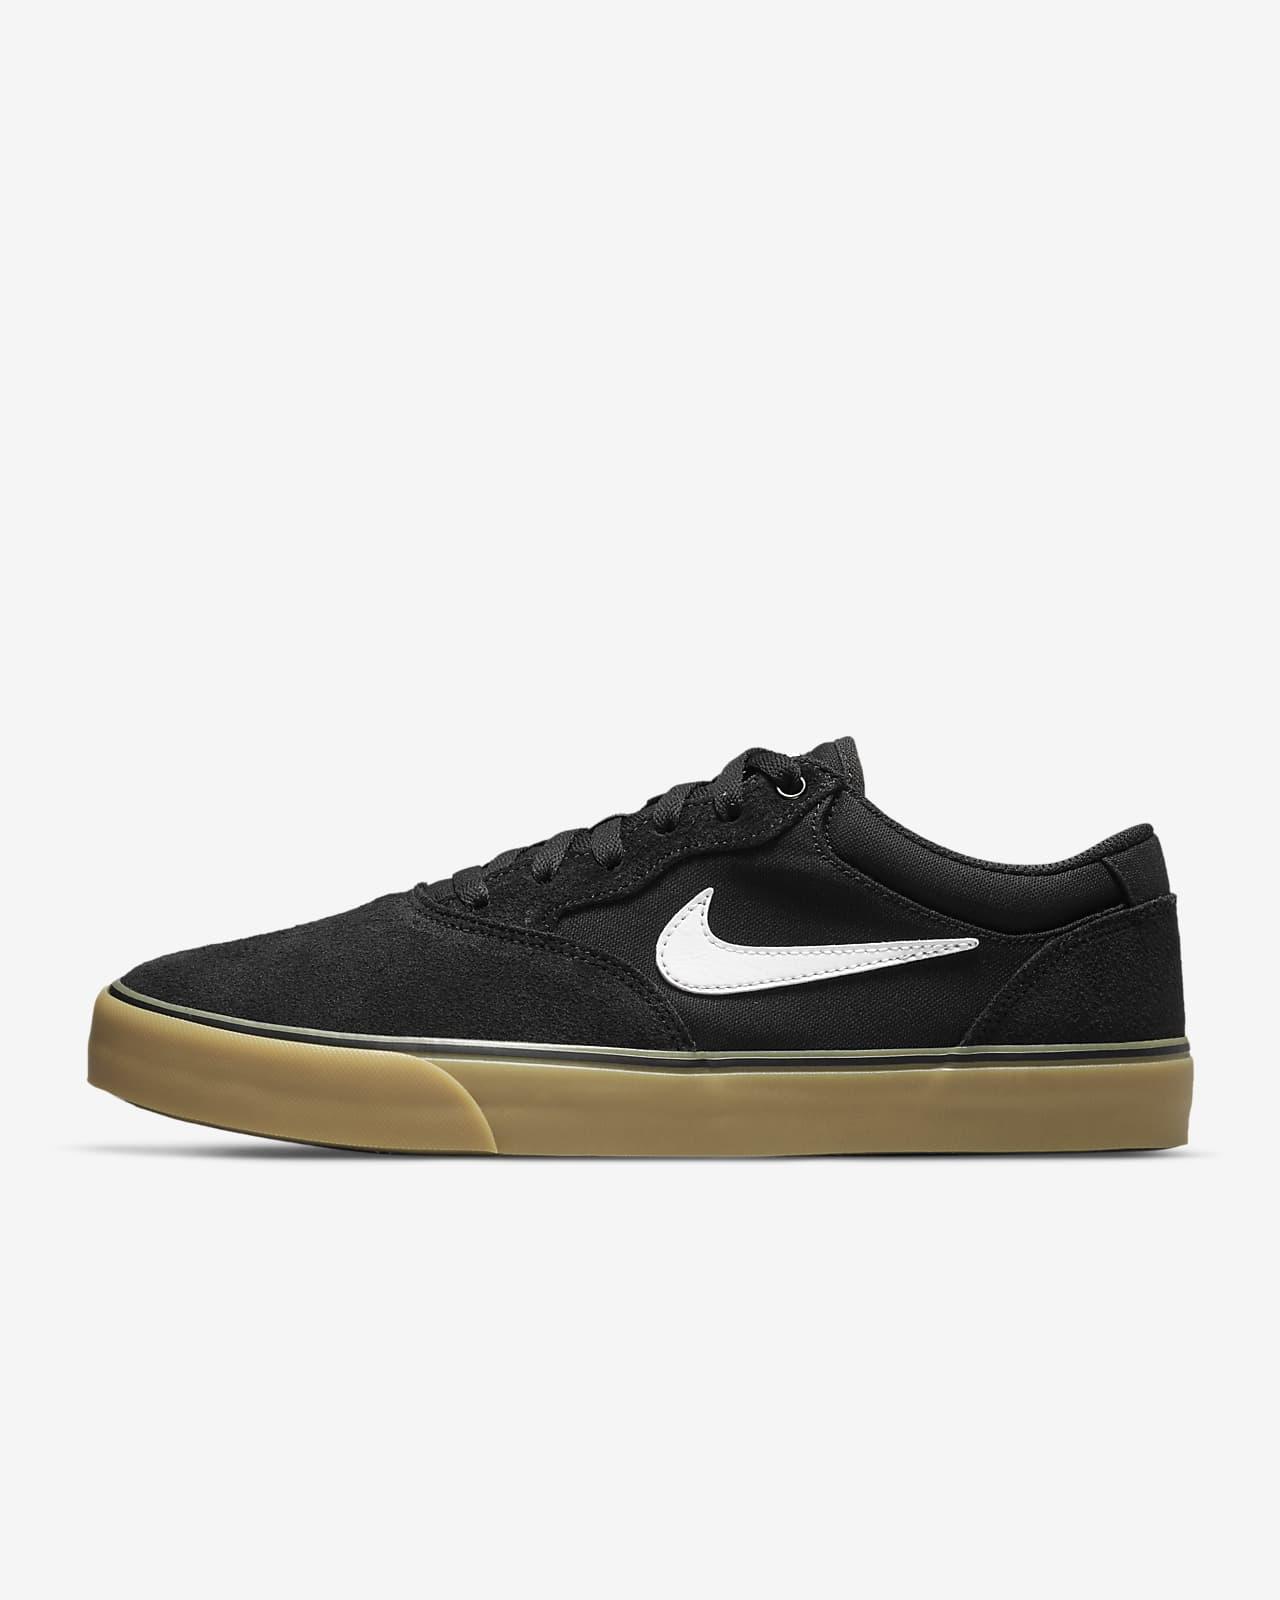 Chaussure de skateboard Nike SB Chron 2. Nike LU